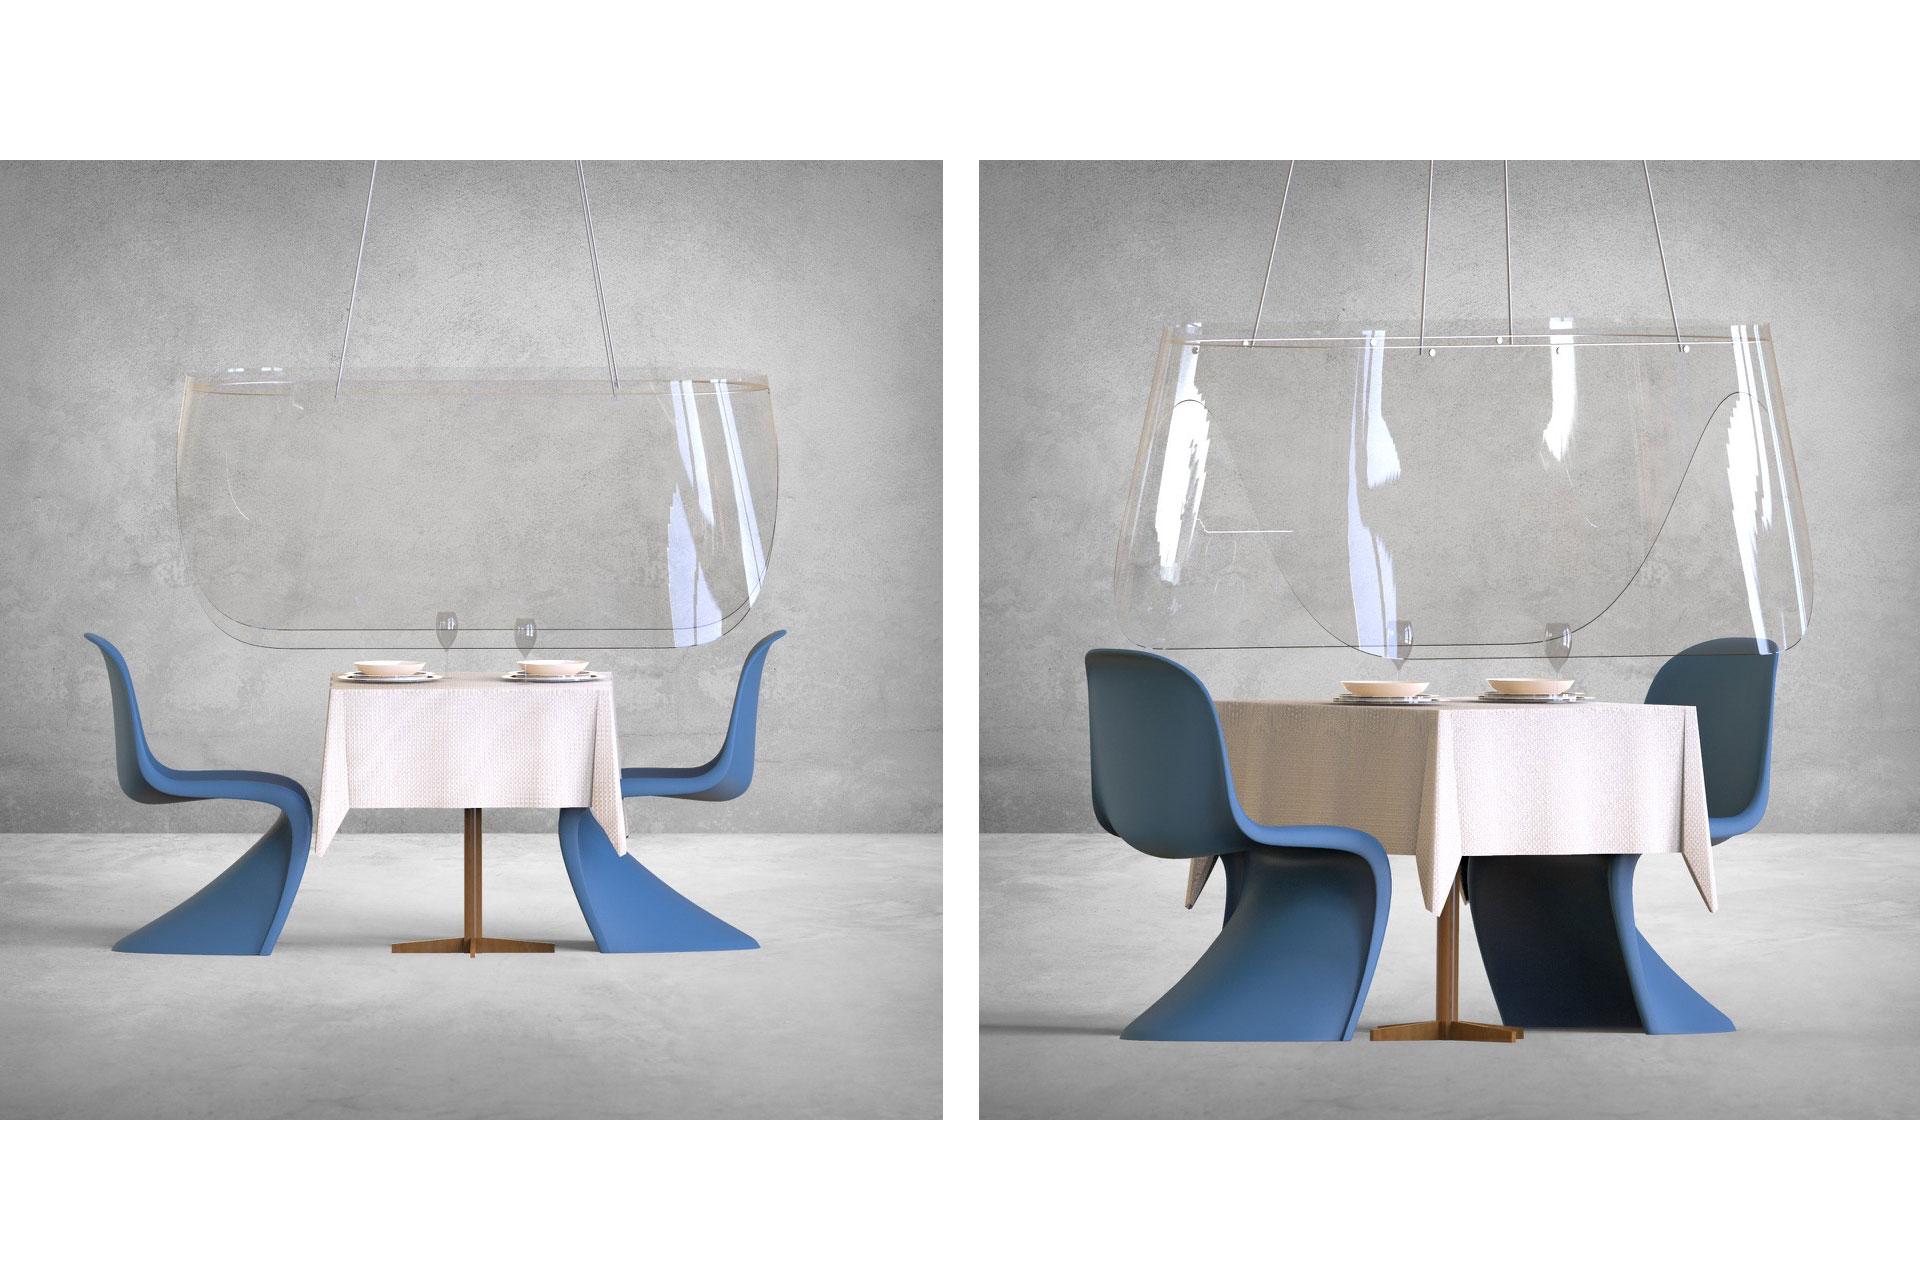 Christophe Gernigon Studio's Plex'Eat shields